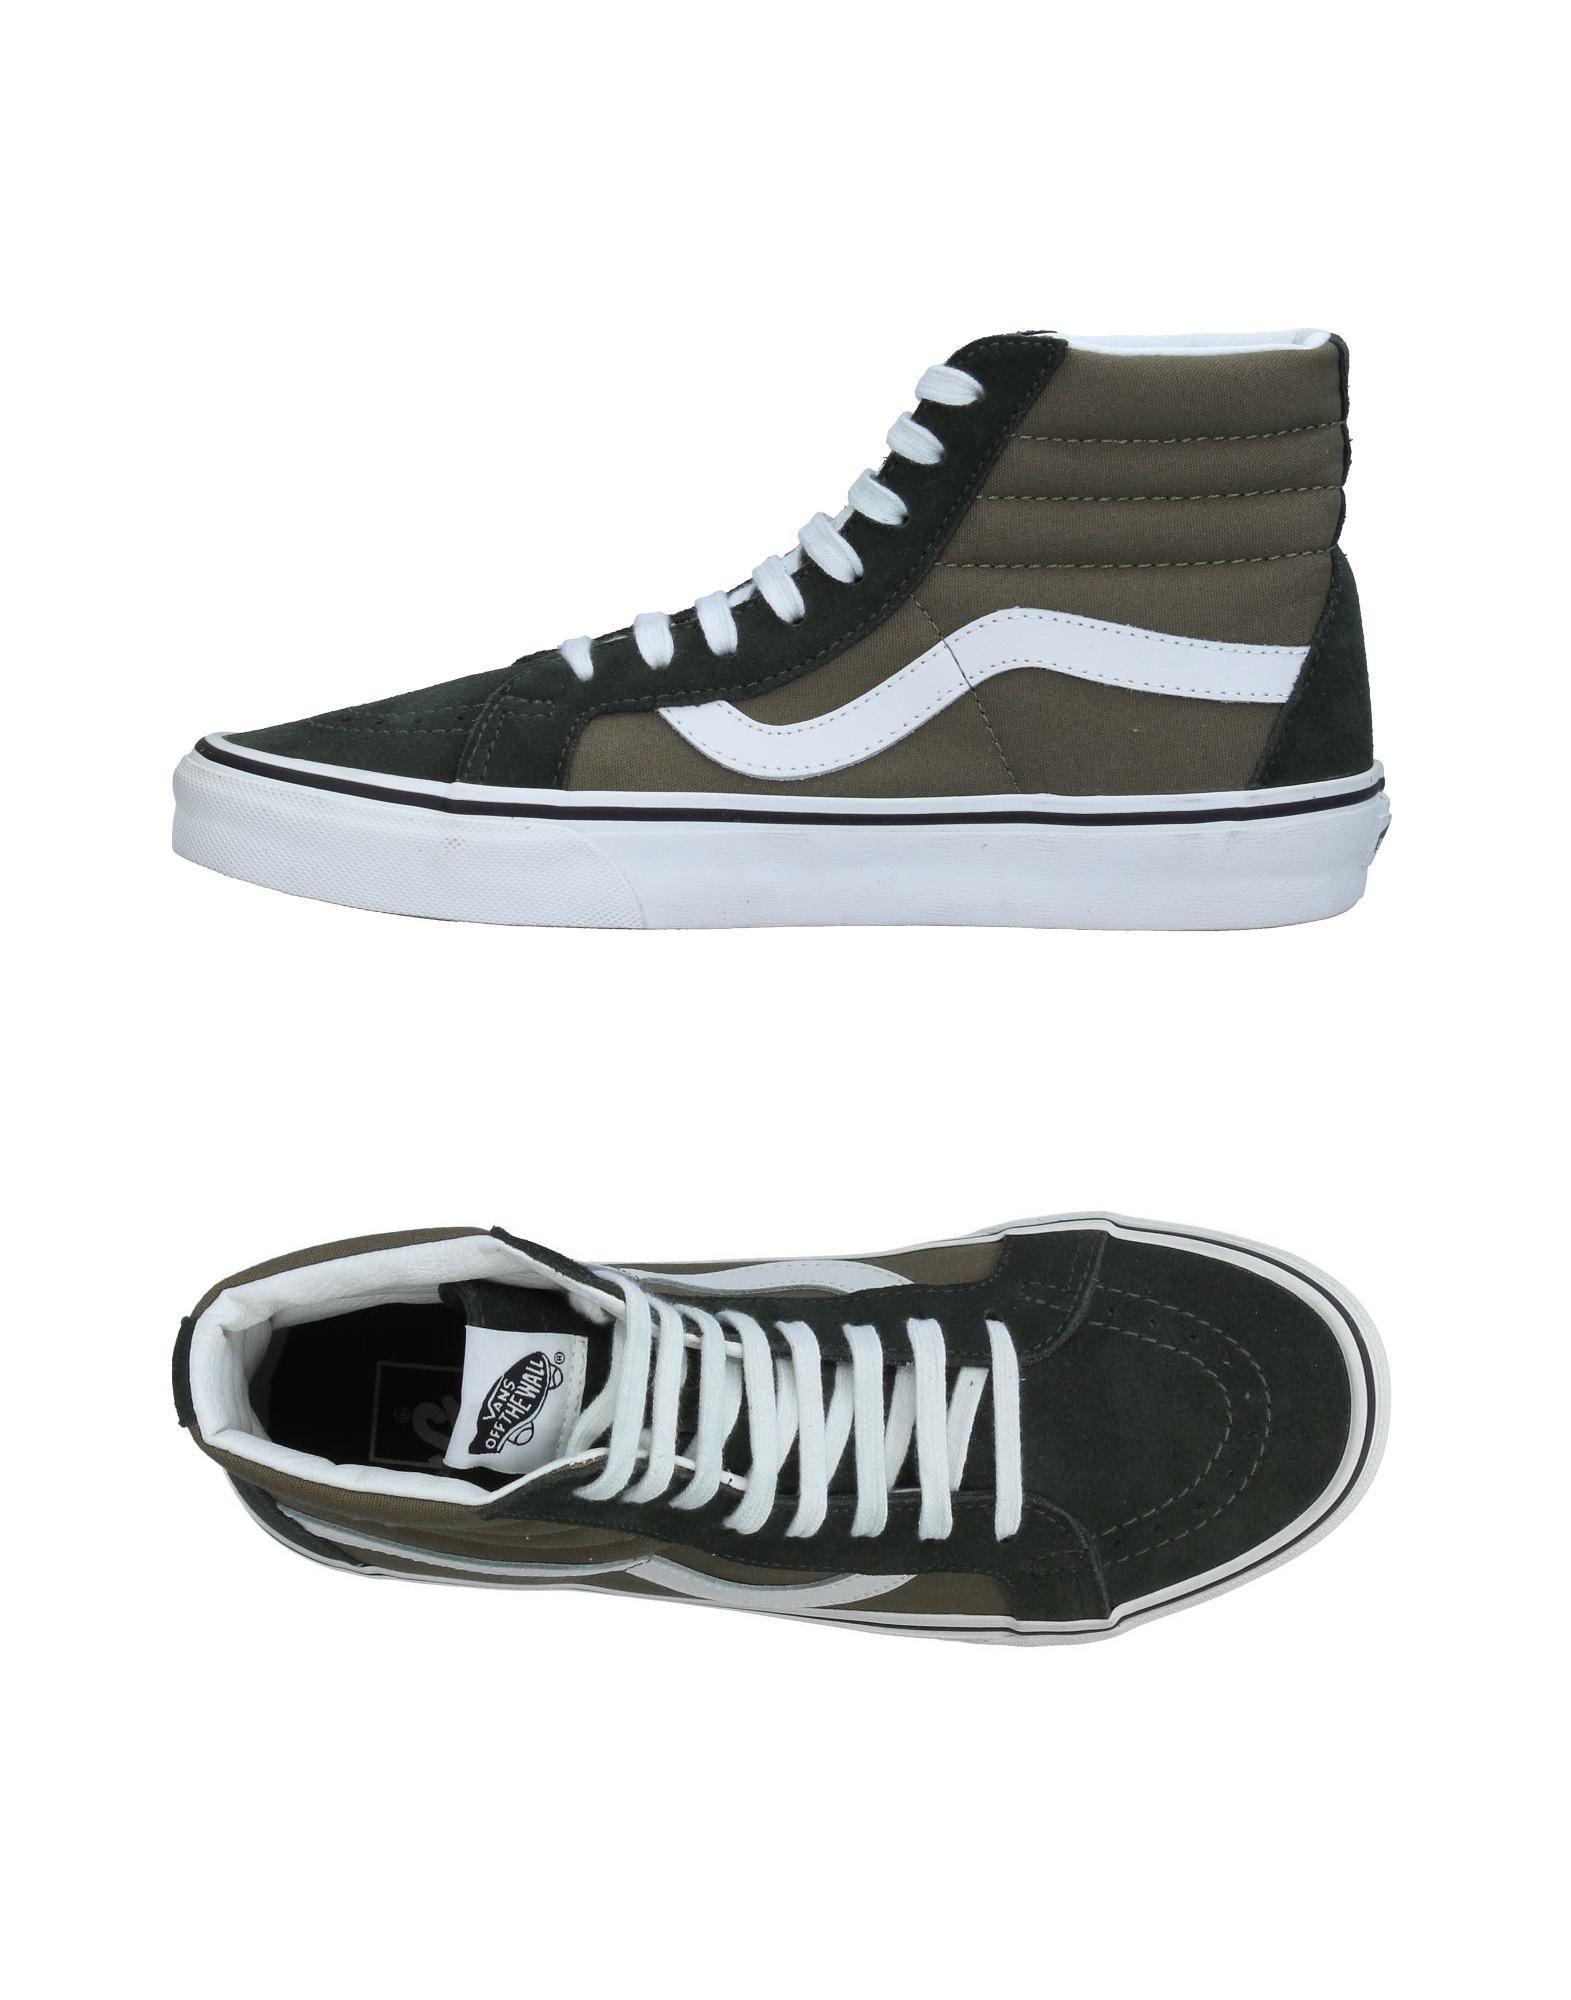 Moda Sneakers Vans Uomo - 11331347AH